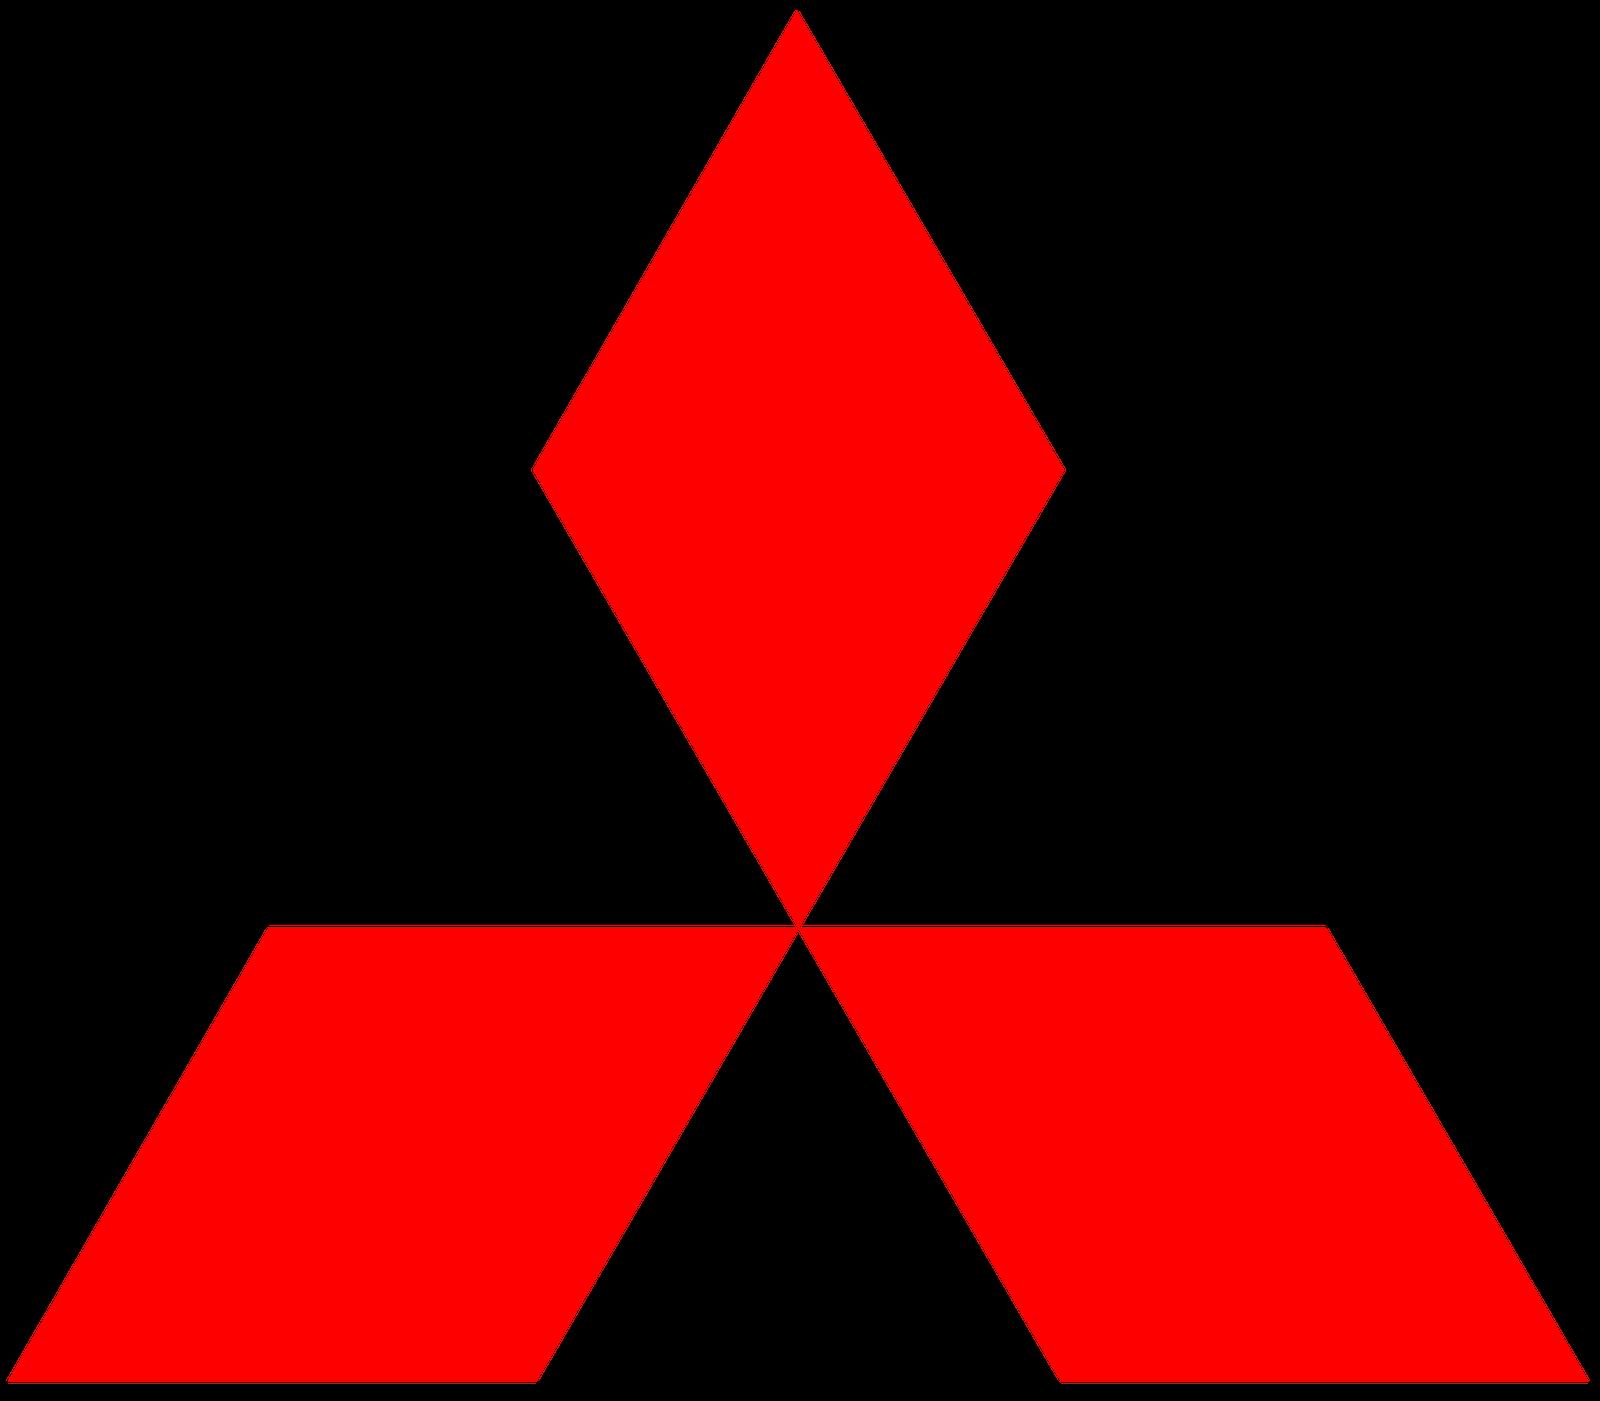 Mitsubishi car logo PNG brand image - Mitsubishi HD PNG